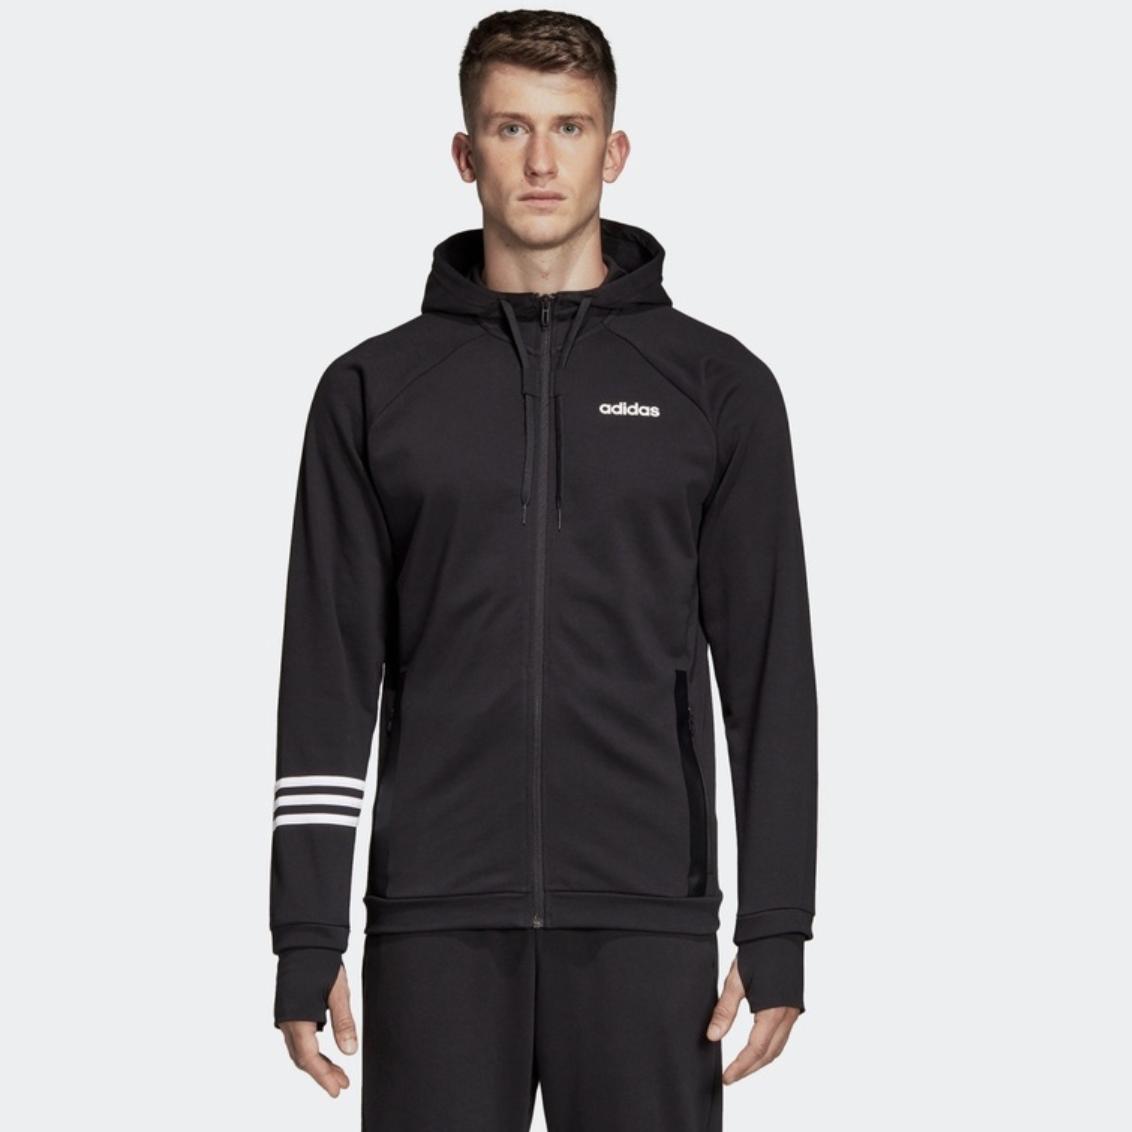 adidas 阿迪达斯 DT8994 男款休闲连帽外套